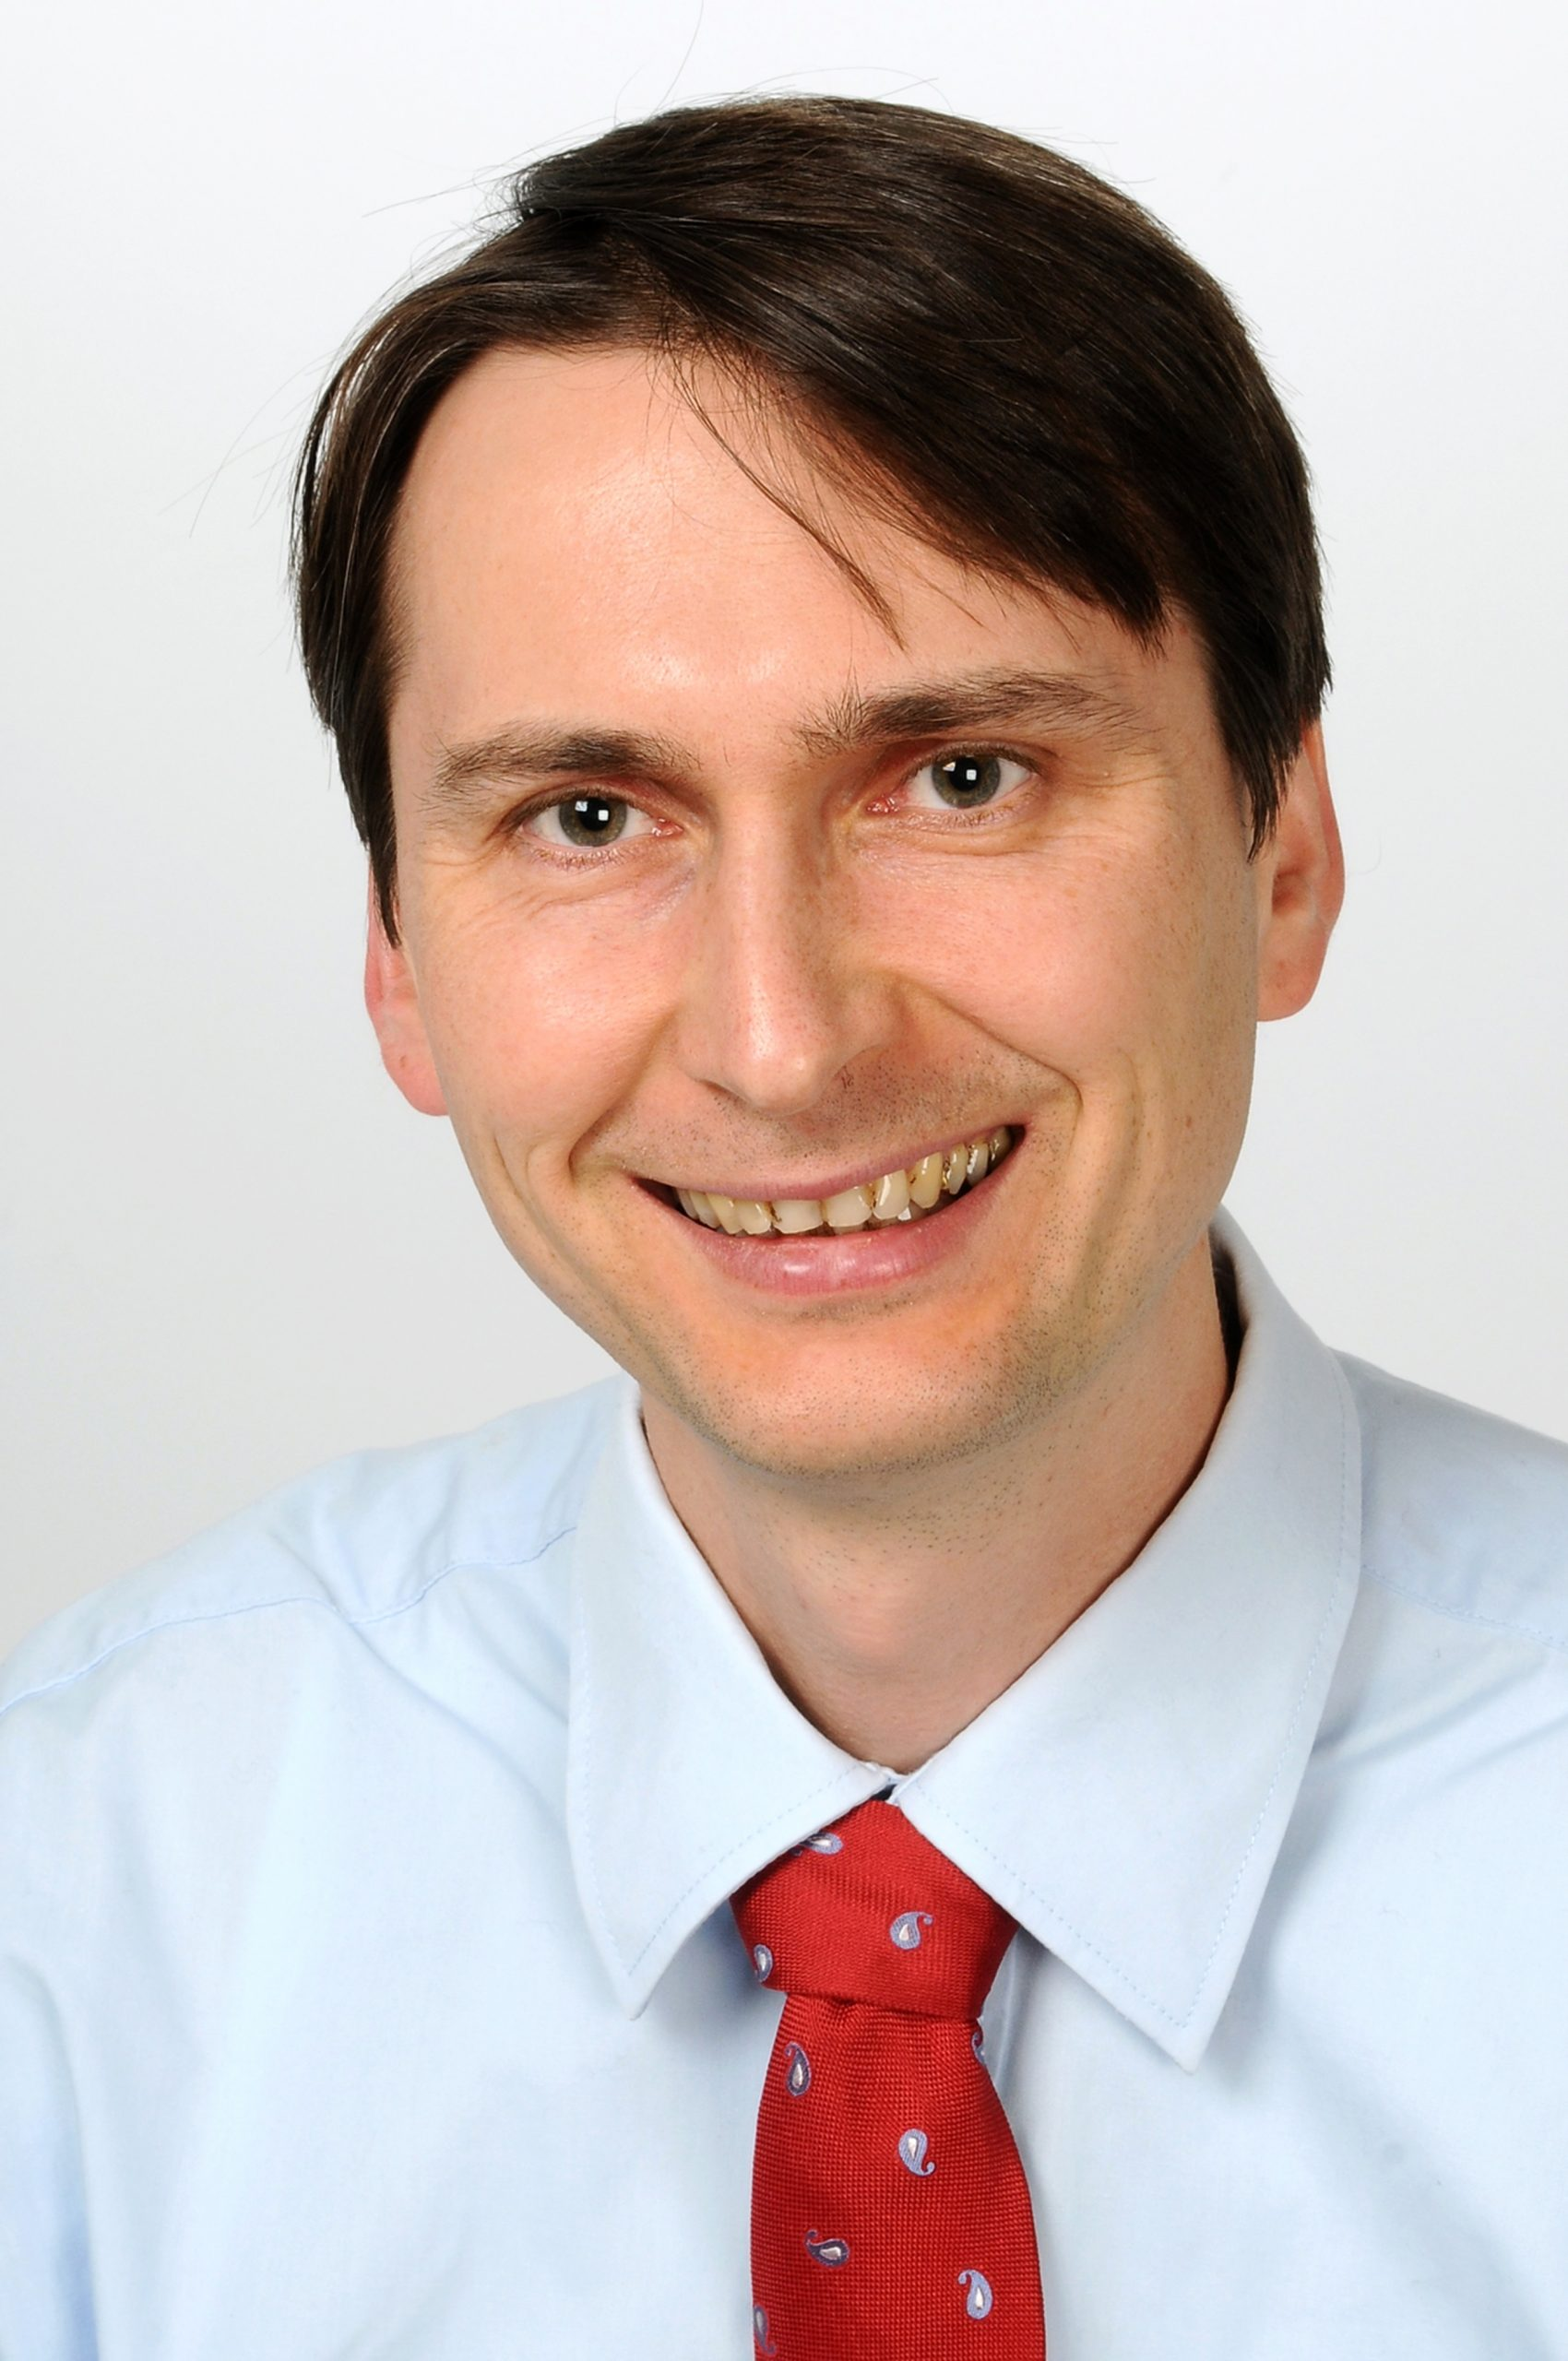 Frank Reimann